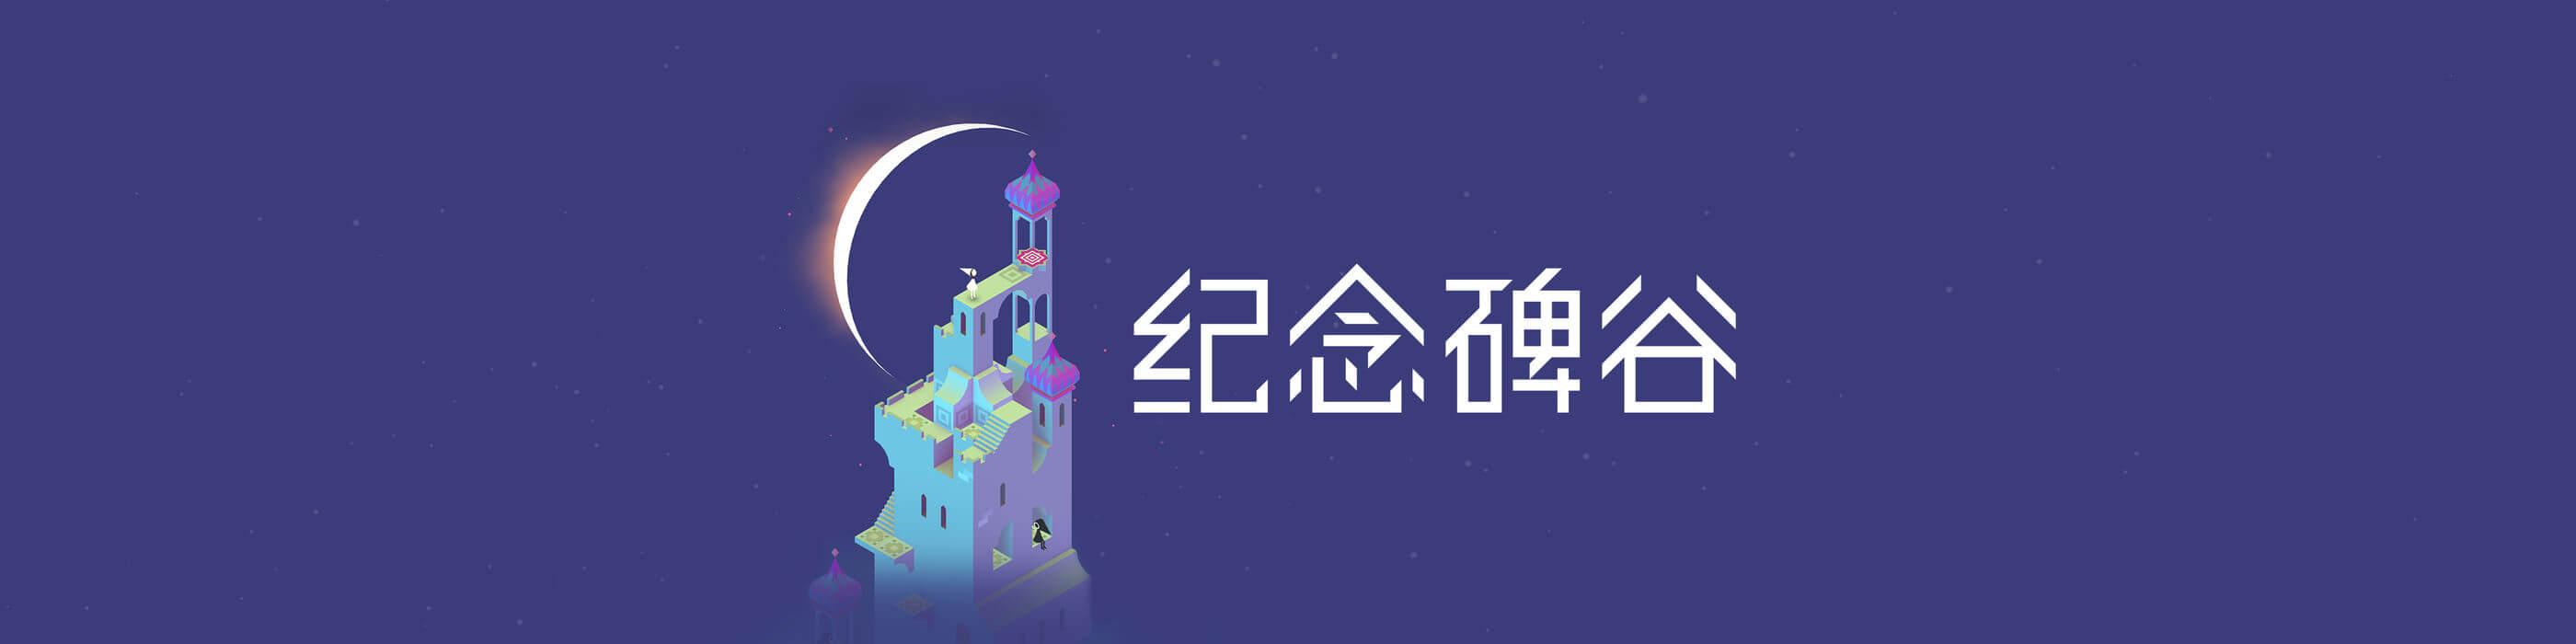 [内购]纪念碑谷 (Monument Valley)套装(1 and 2)-草蜢资源